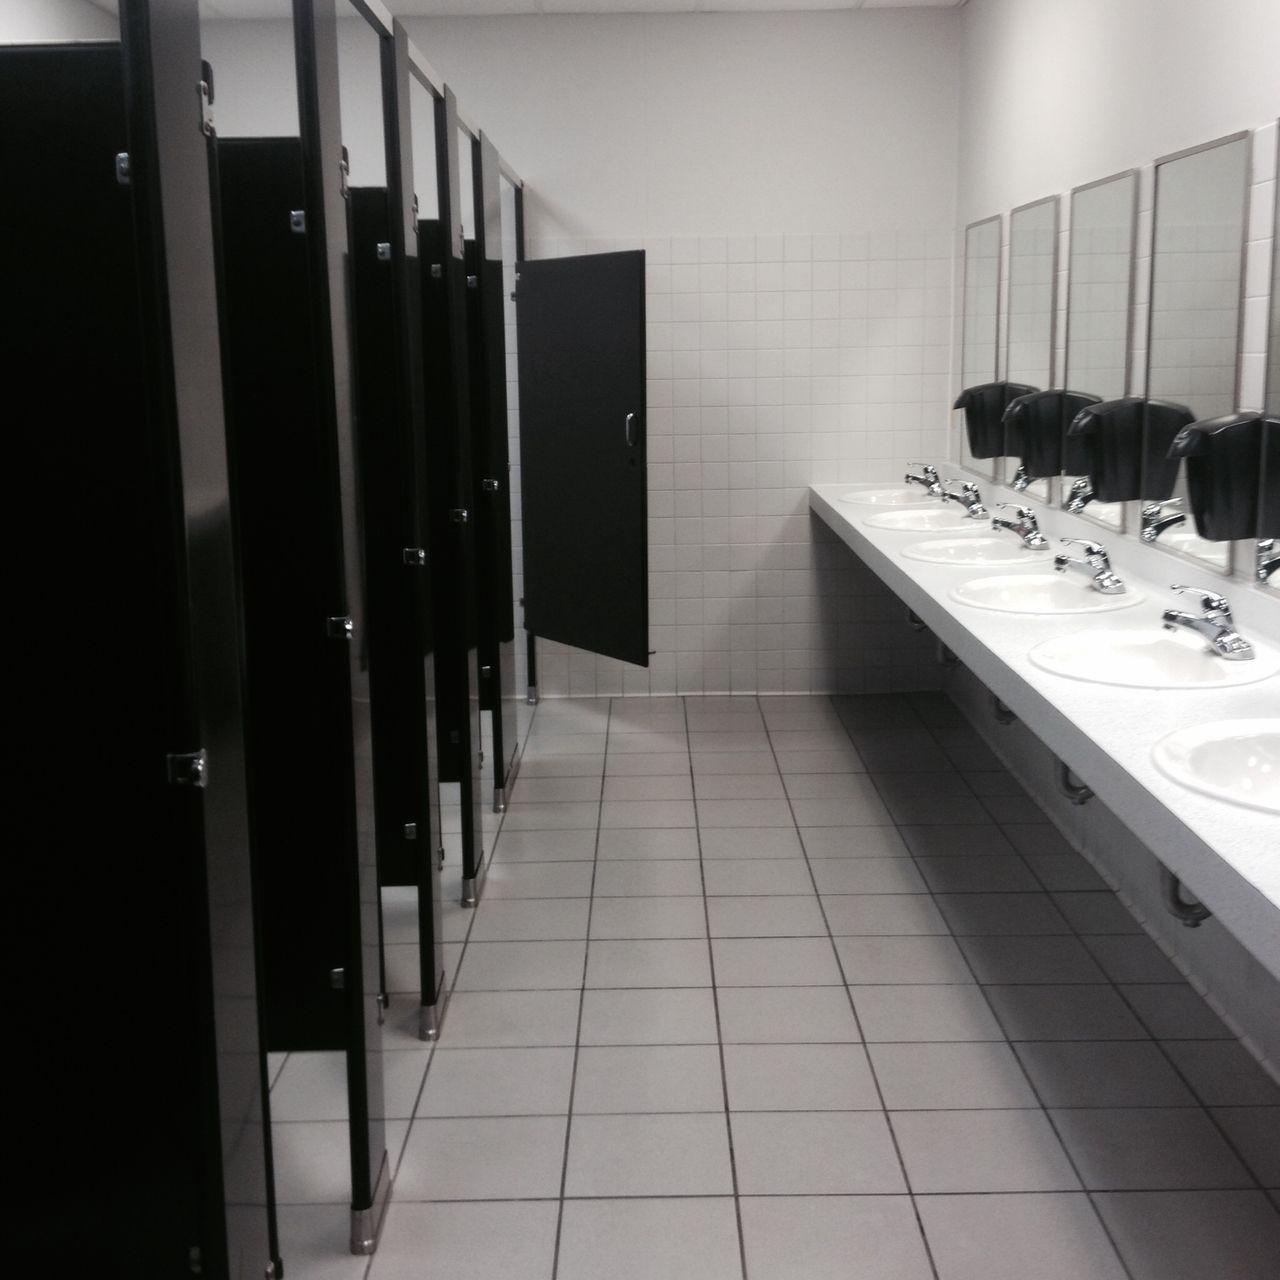 Black N White Bathroom: Pin By ๑ Zoe ๑ On Inside ☆ミ